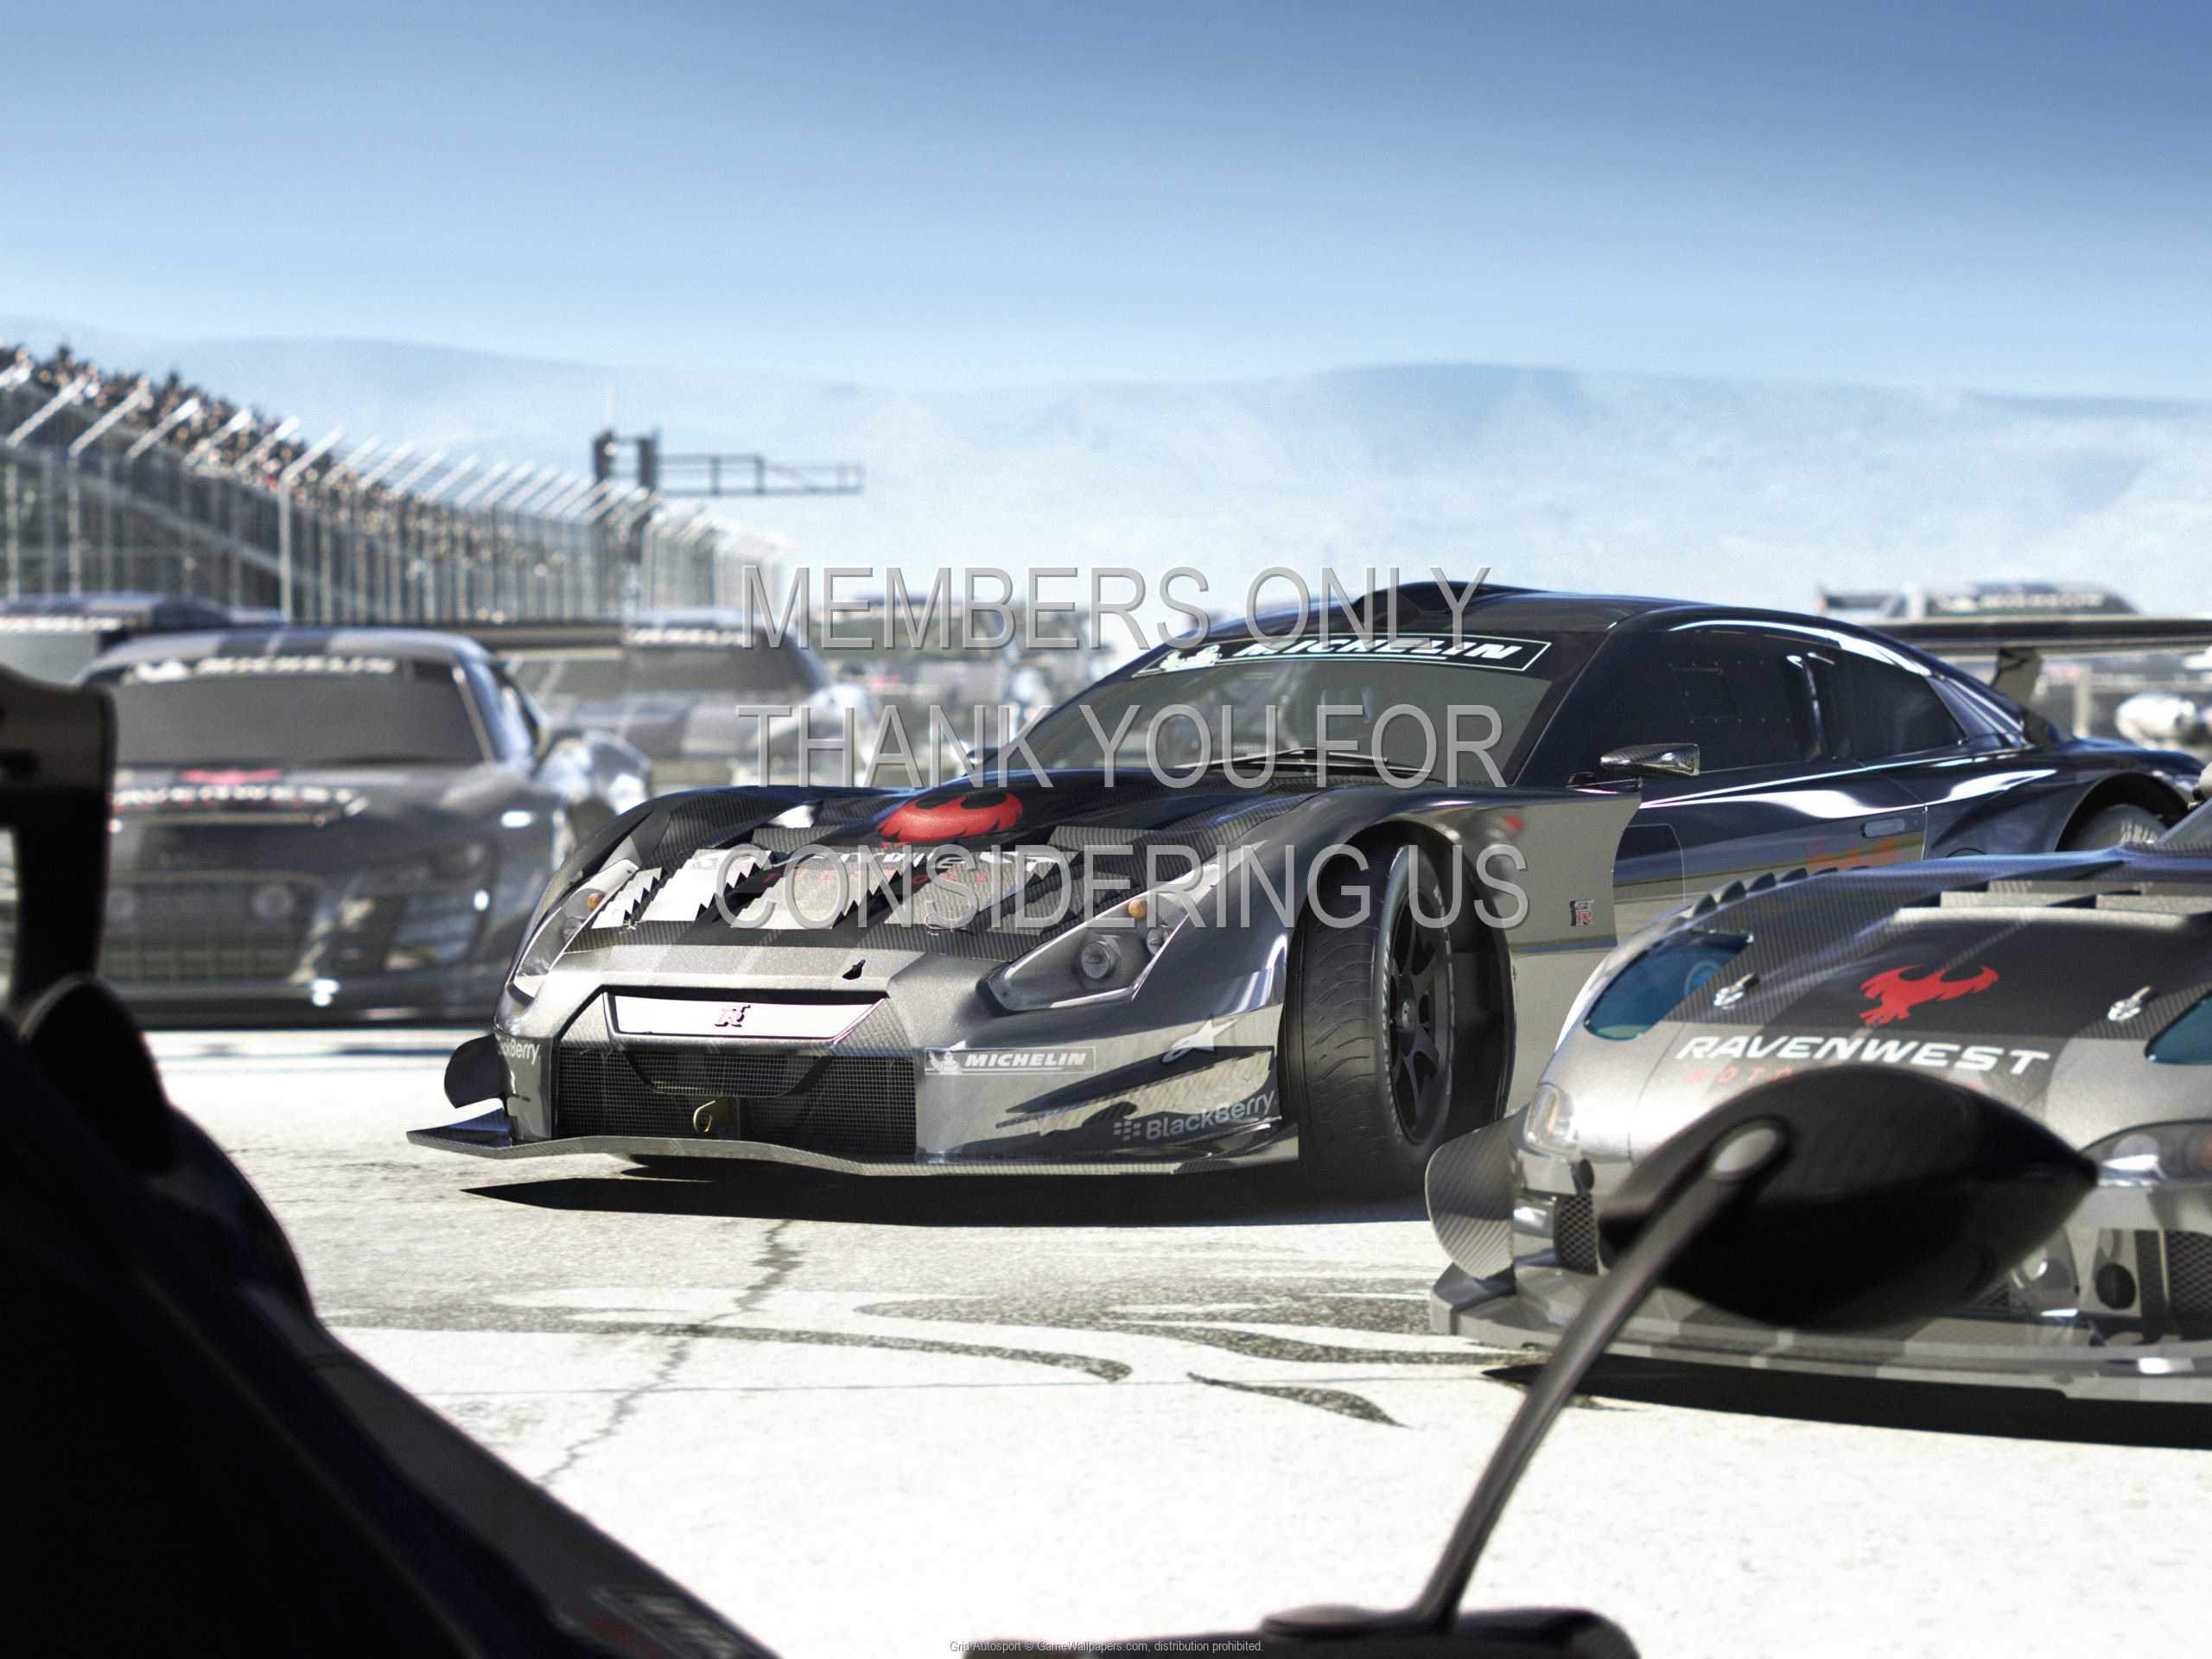 Grid Autosport 1080p Horizontal Mobile wallpaper or background 03